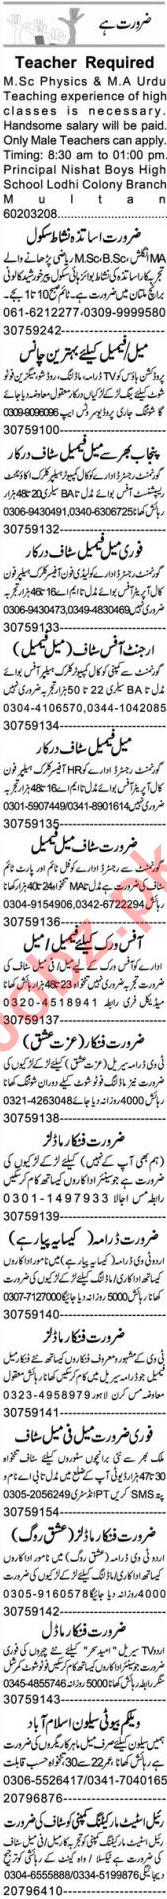 Teacher & Accountant Jobs 2021 in Multan